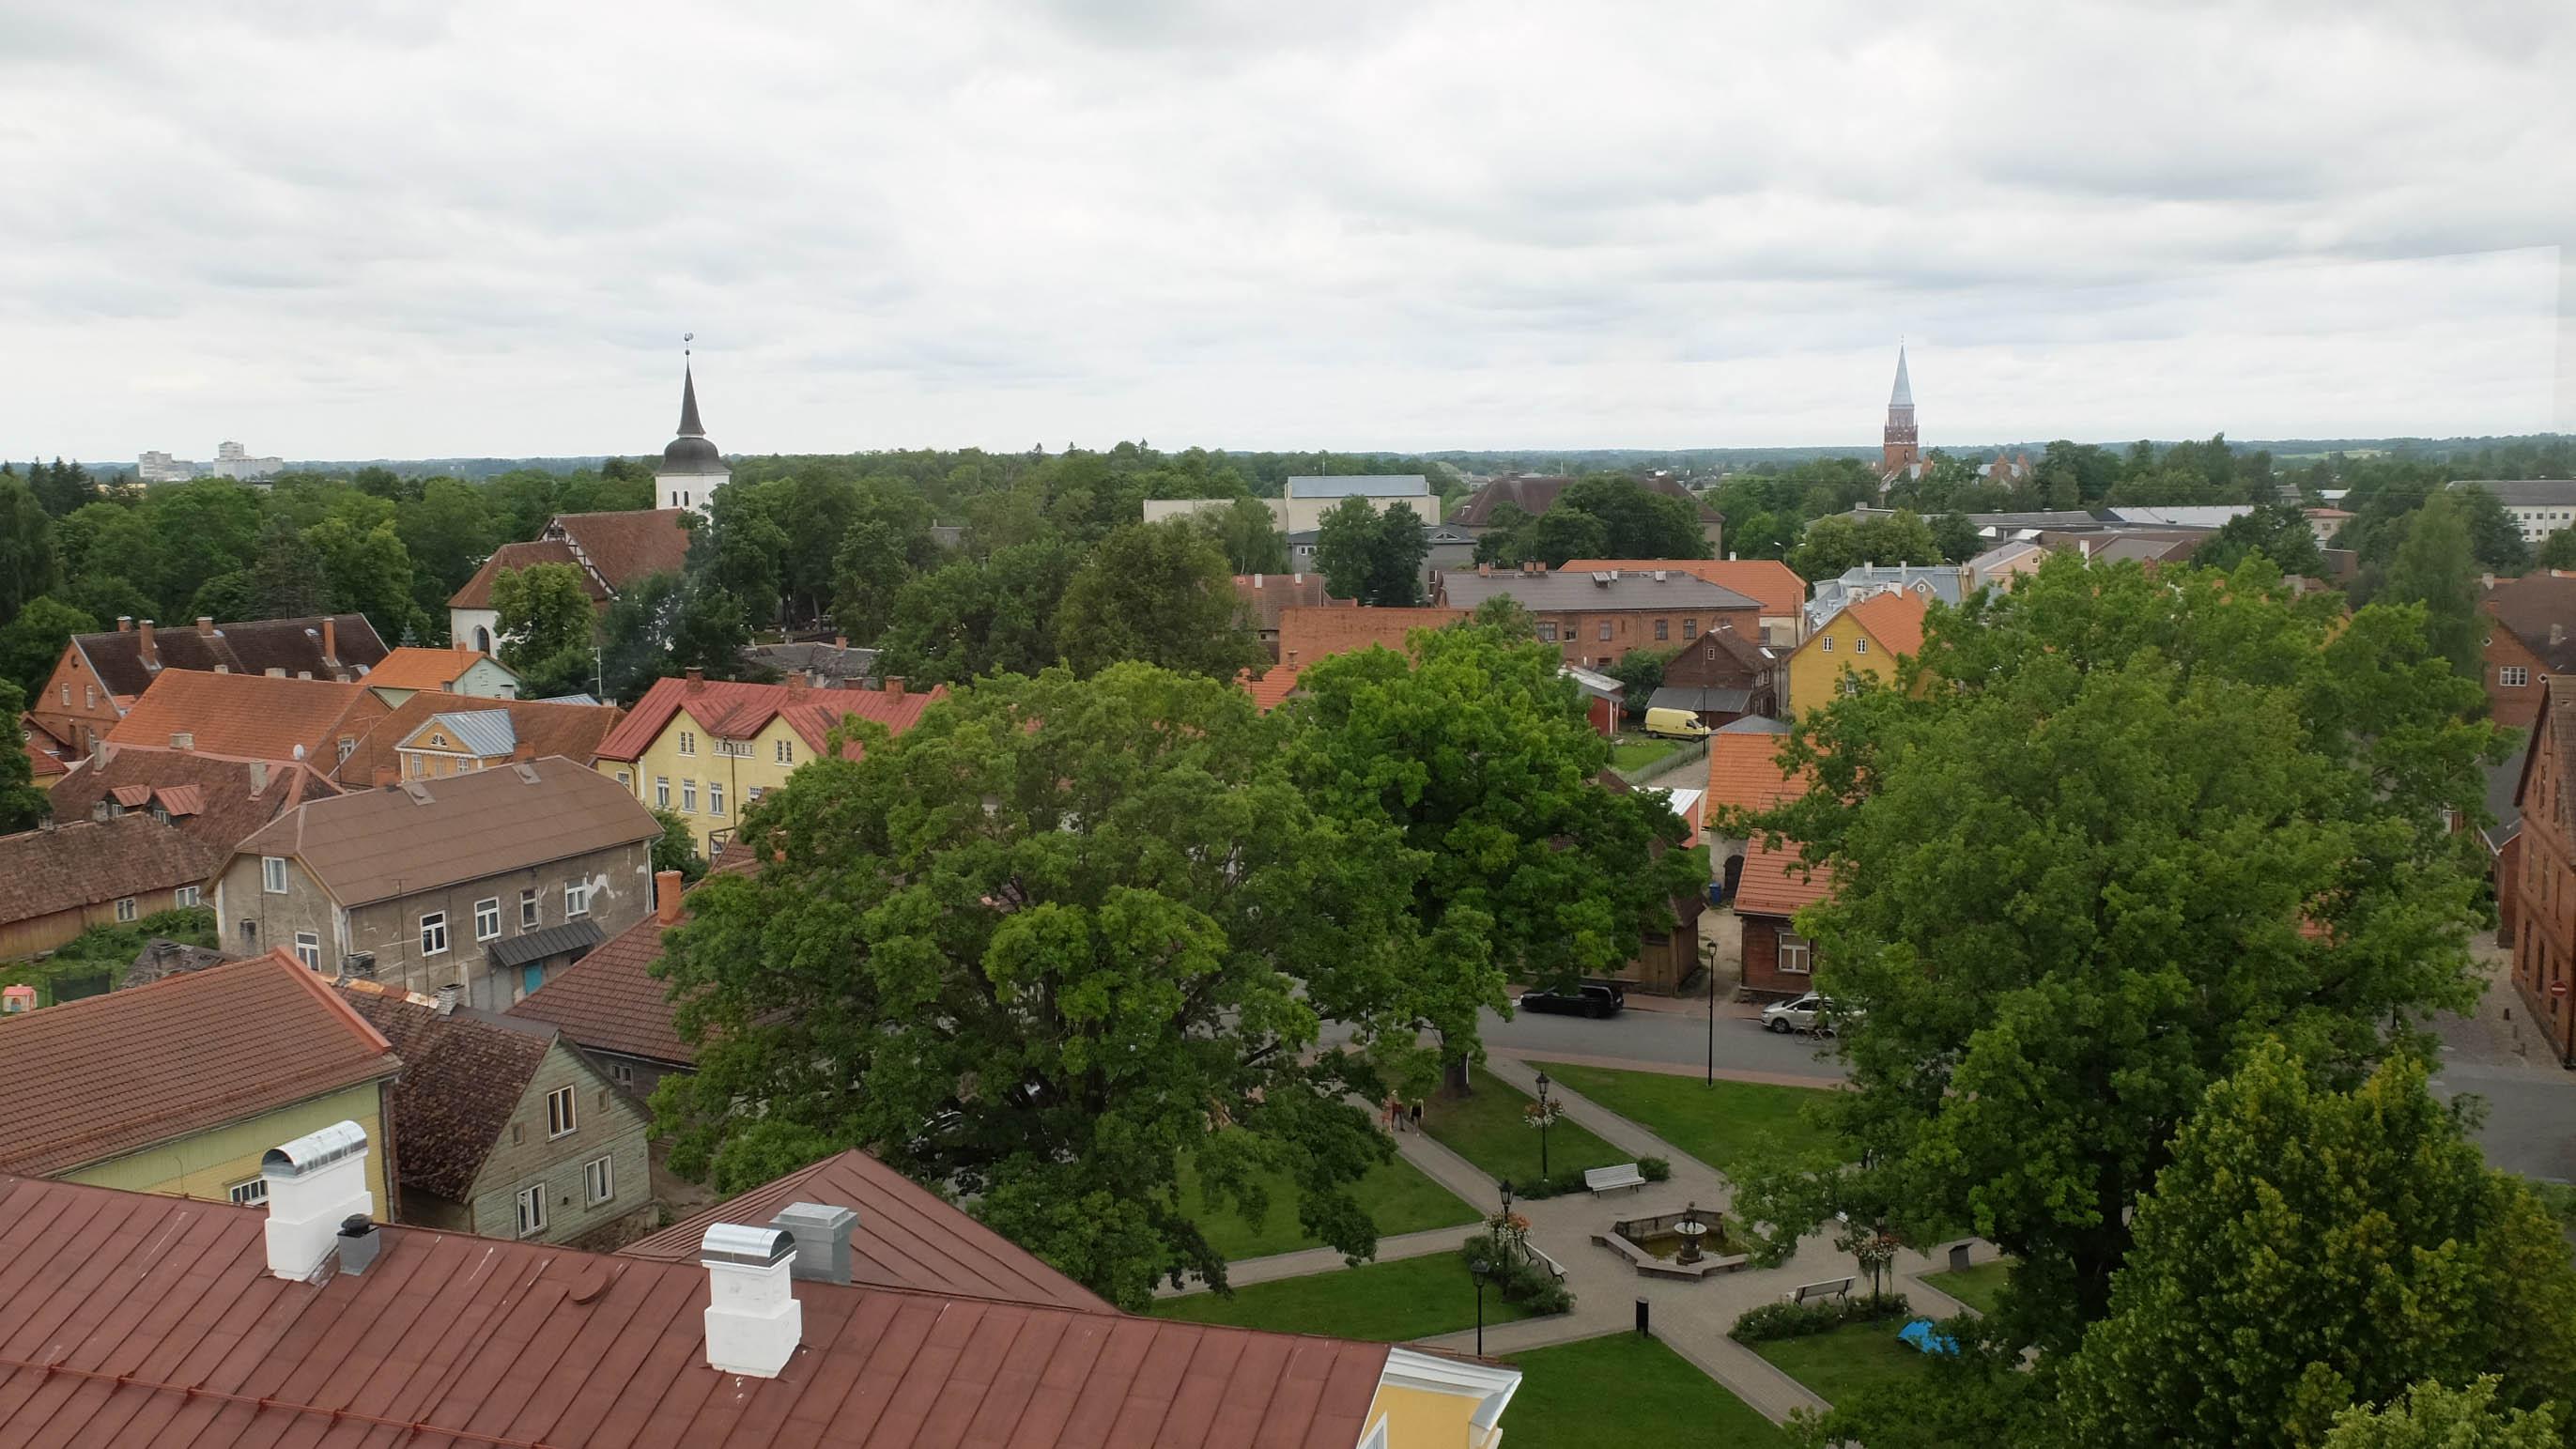 Панорама Вильянди с водонапорной башни